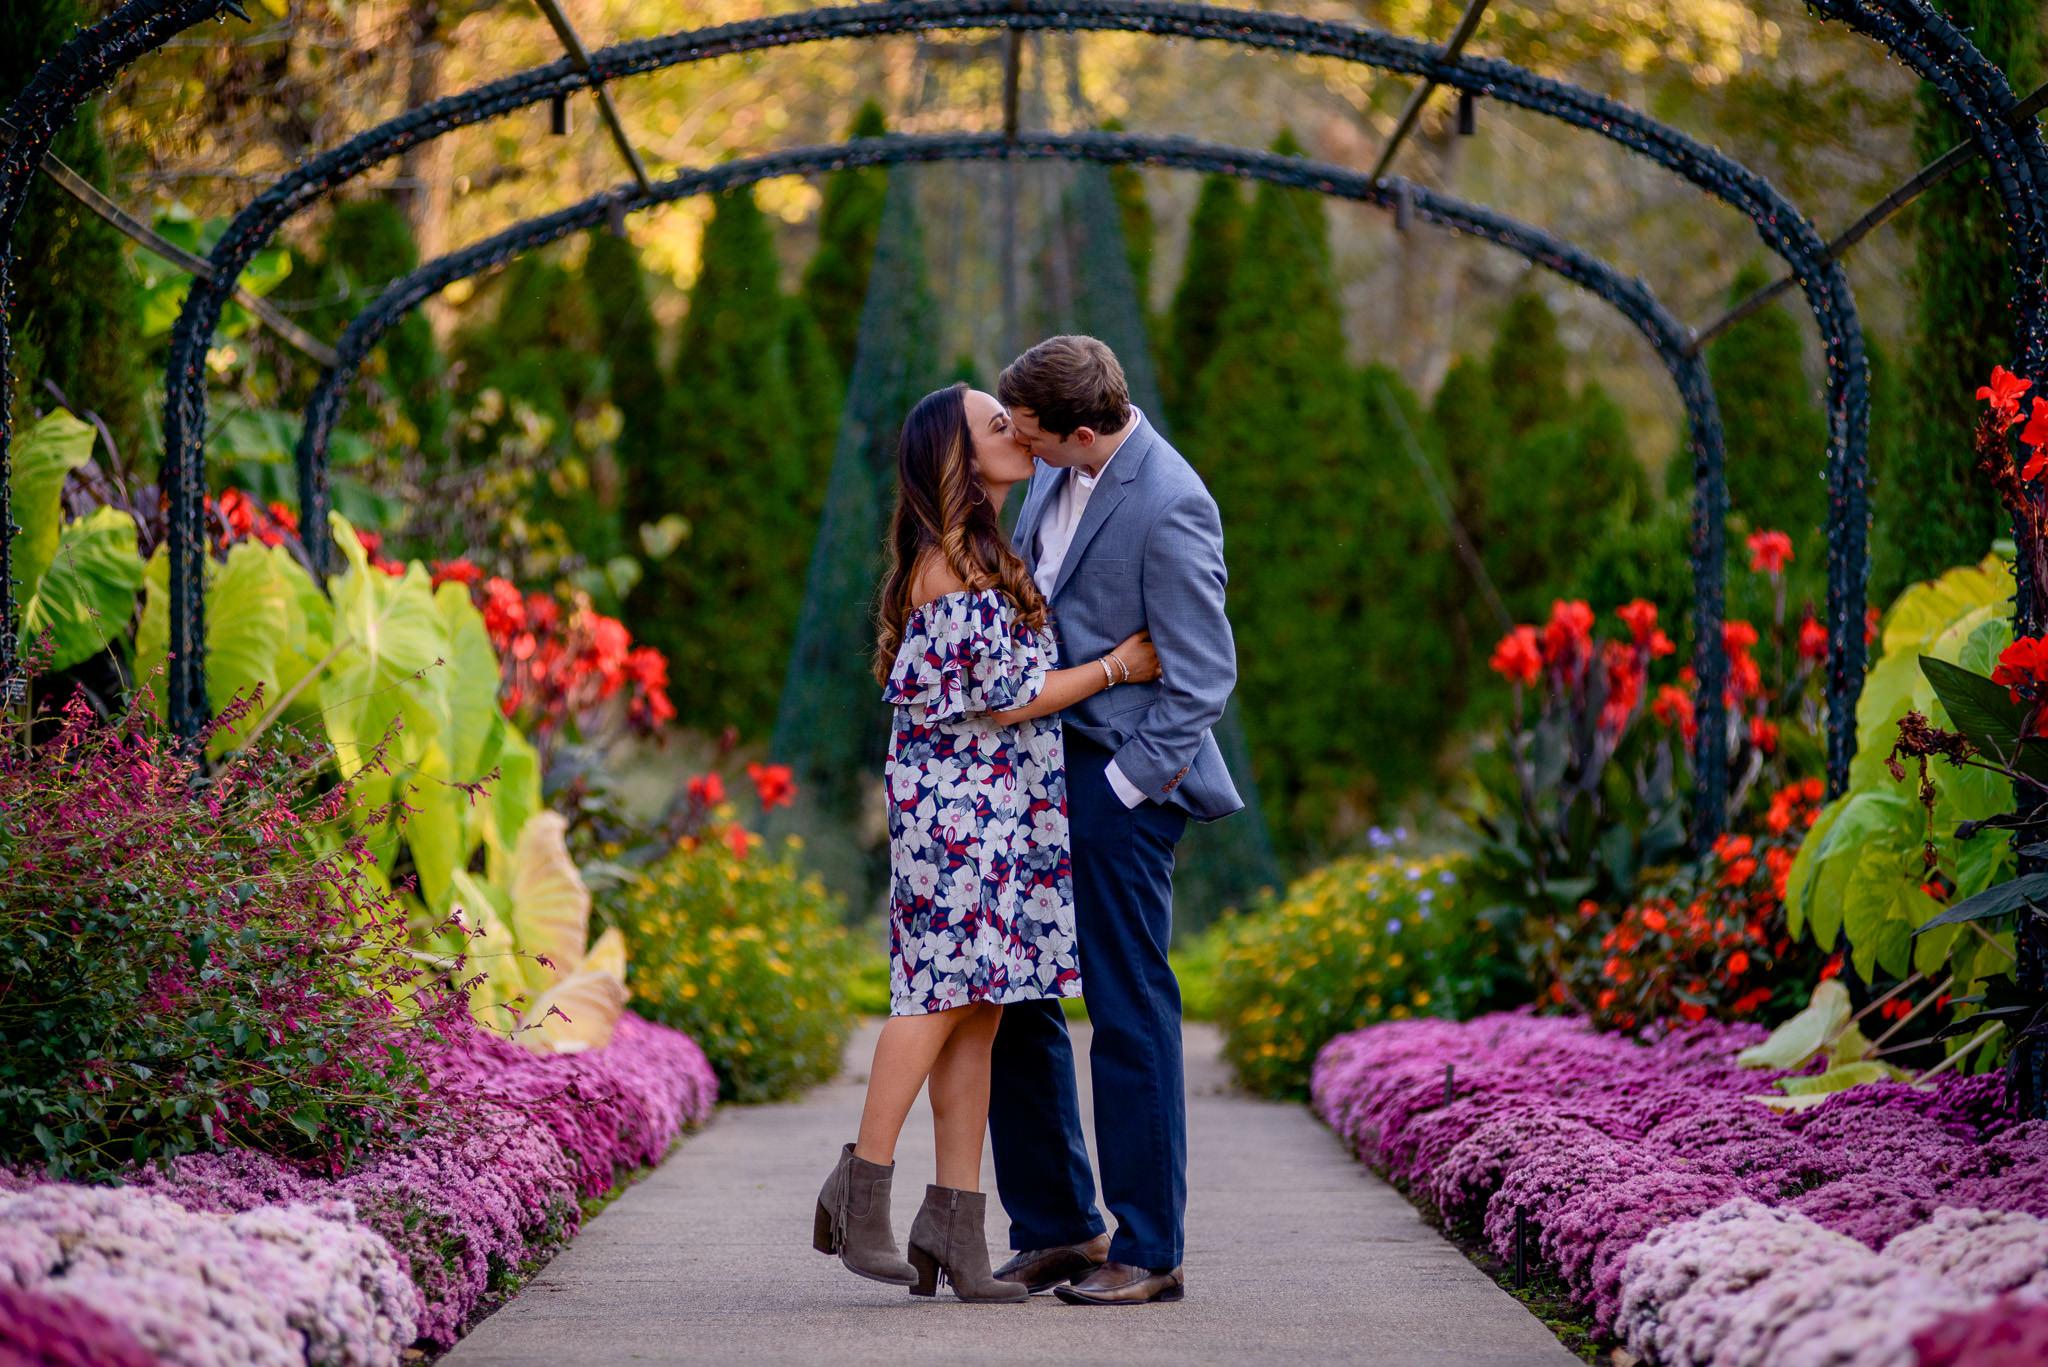 Greg and Jess Photography Nashville Portrait and Wedding Photographer 65.jpg